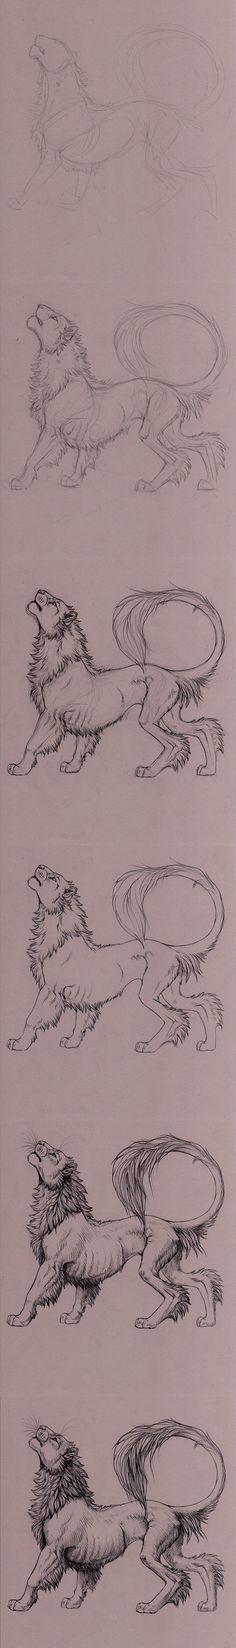 lion steps by hibbary.deviantart.com on @deviantART